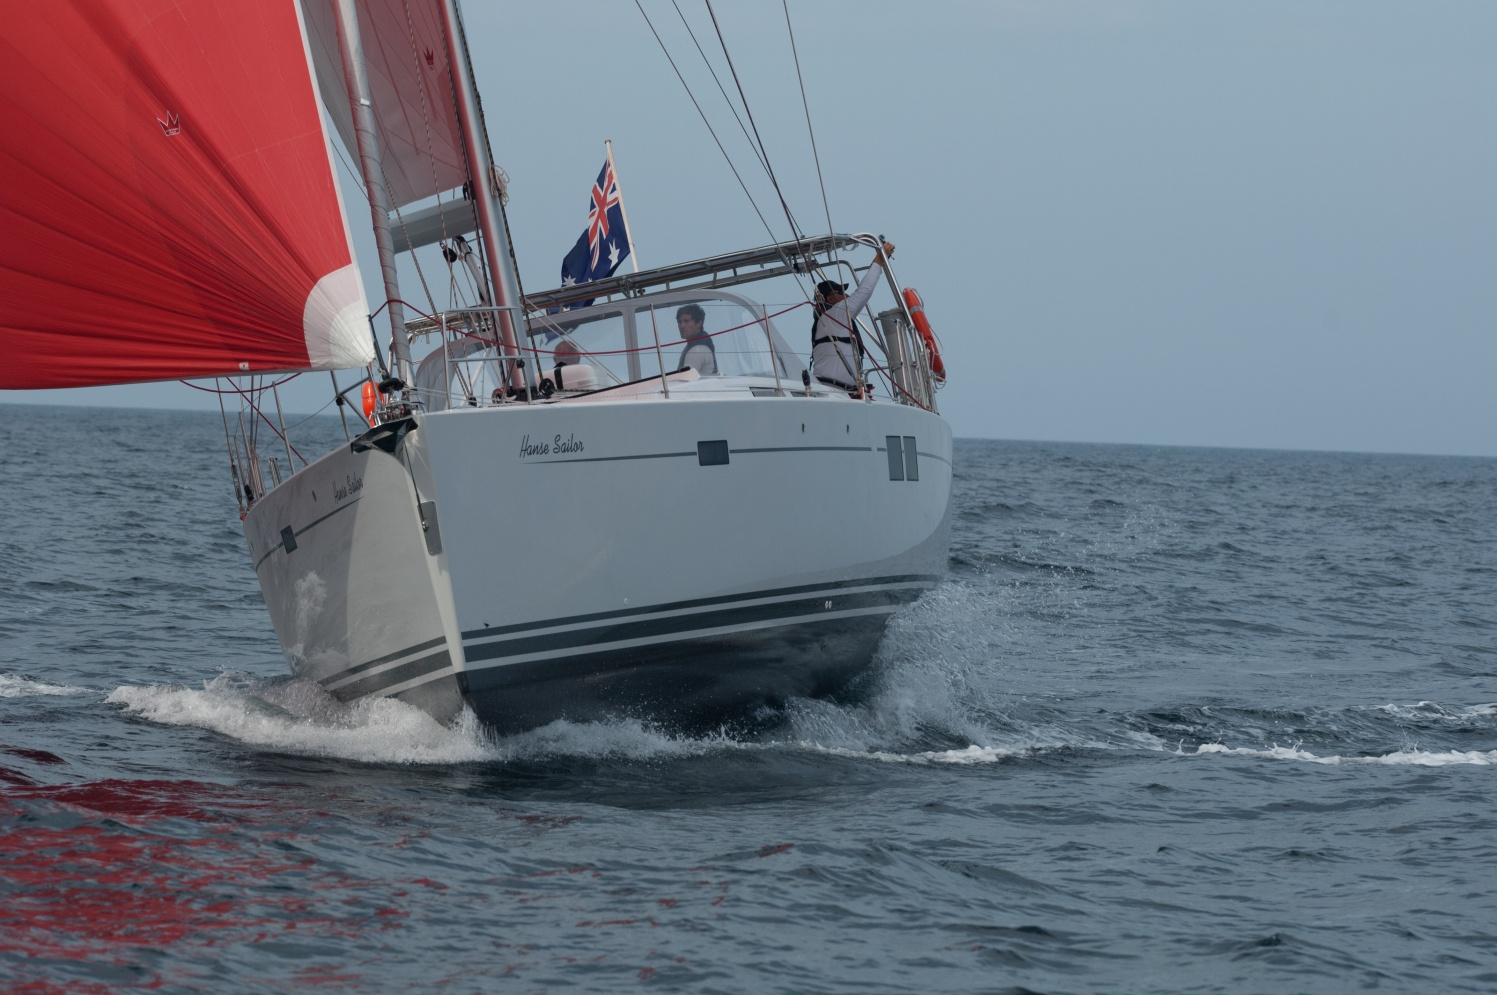 Click image for larger version  Name:Spain - Hanse Sailor-0015.jpg Views:150 Size:406.3 KB ID:99967